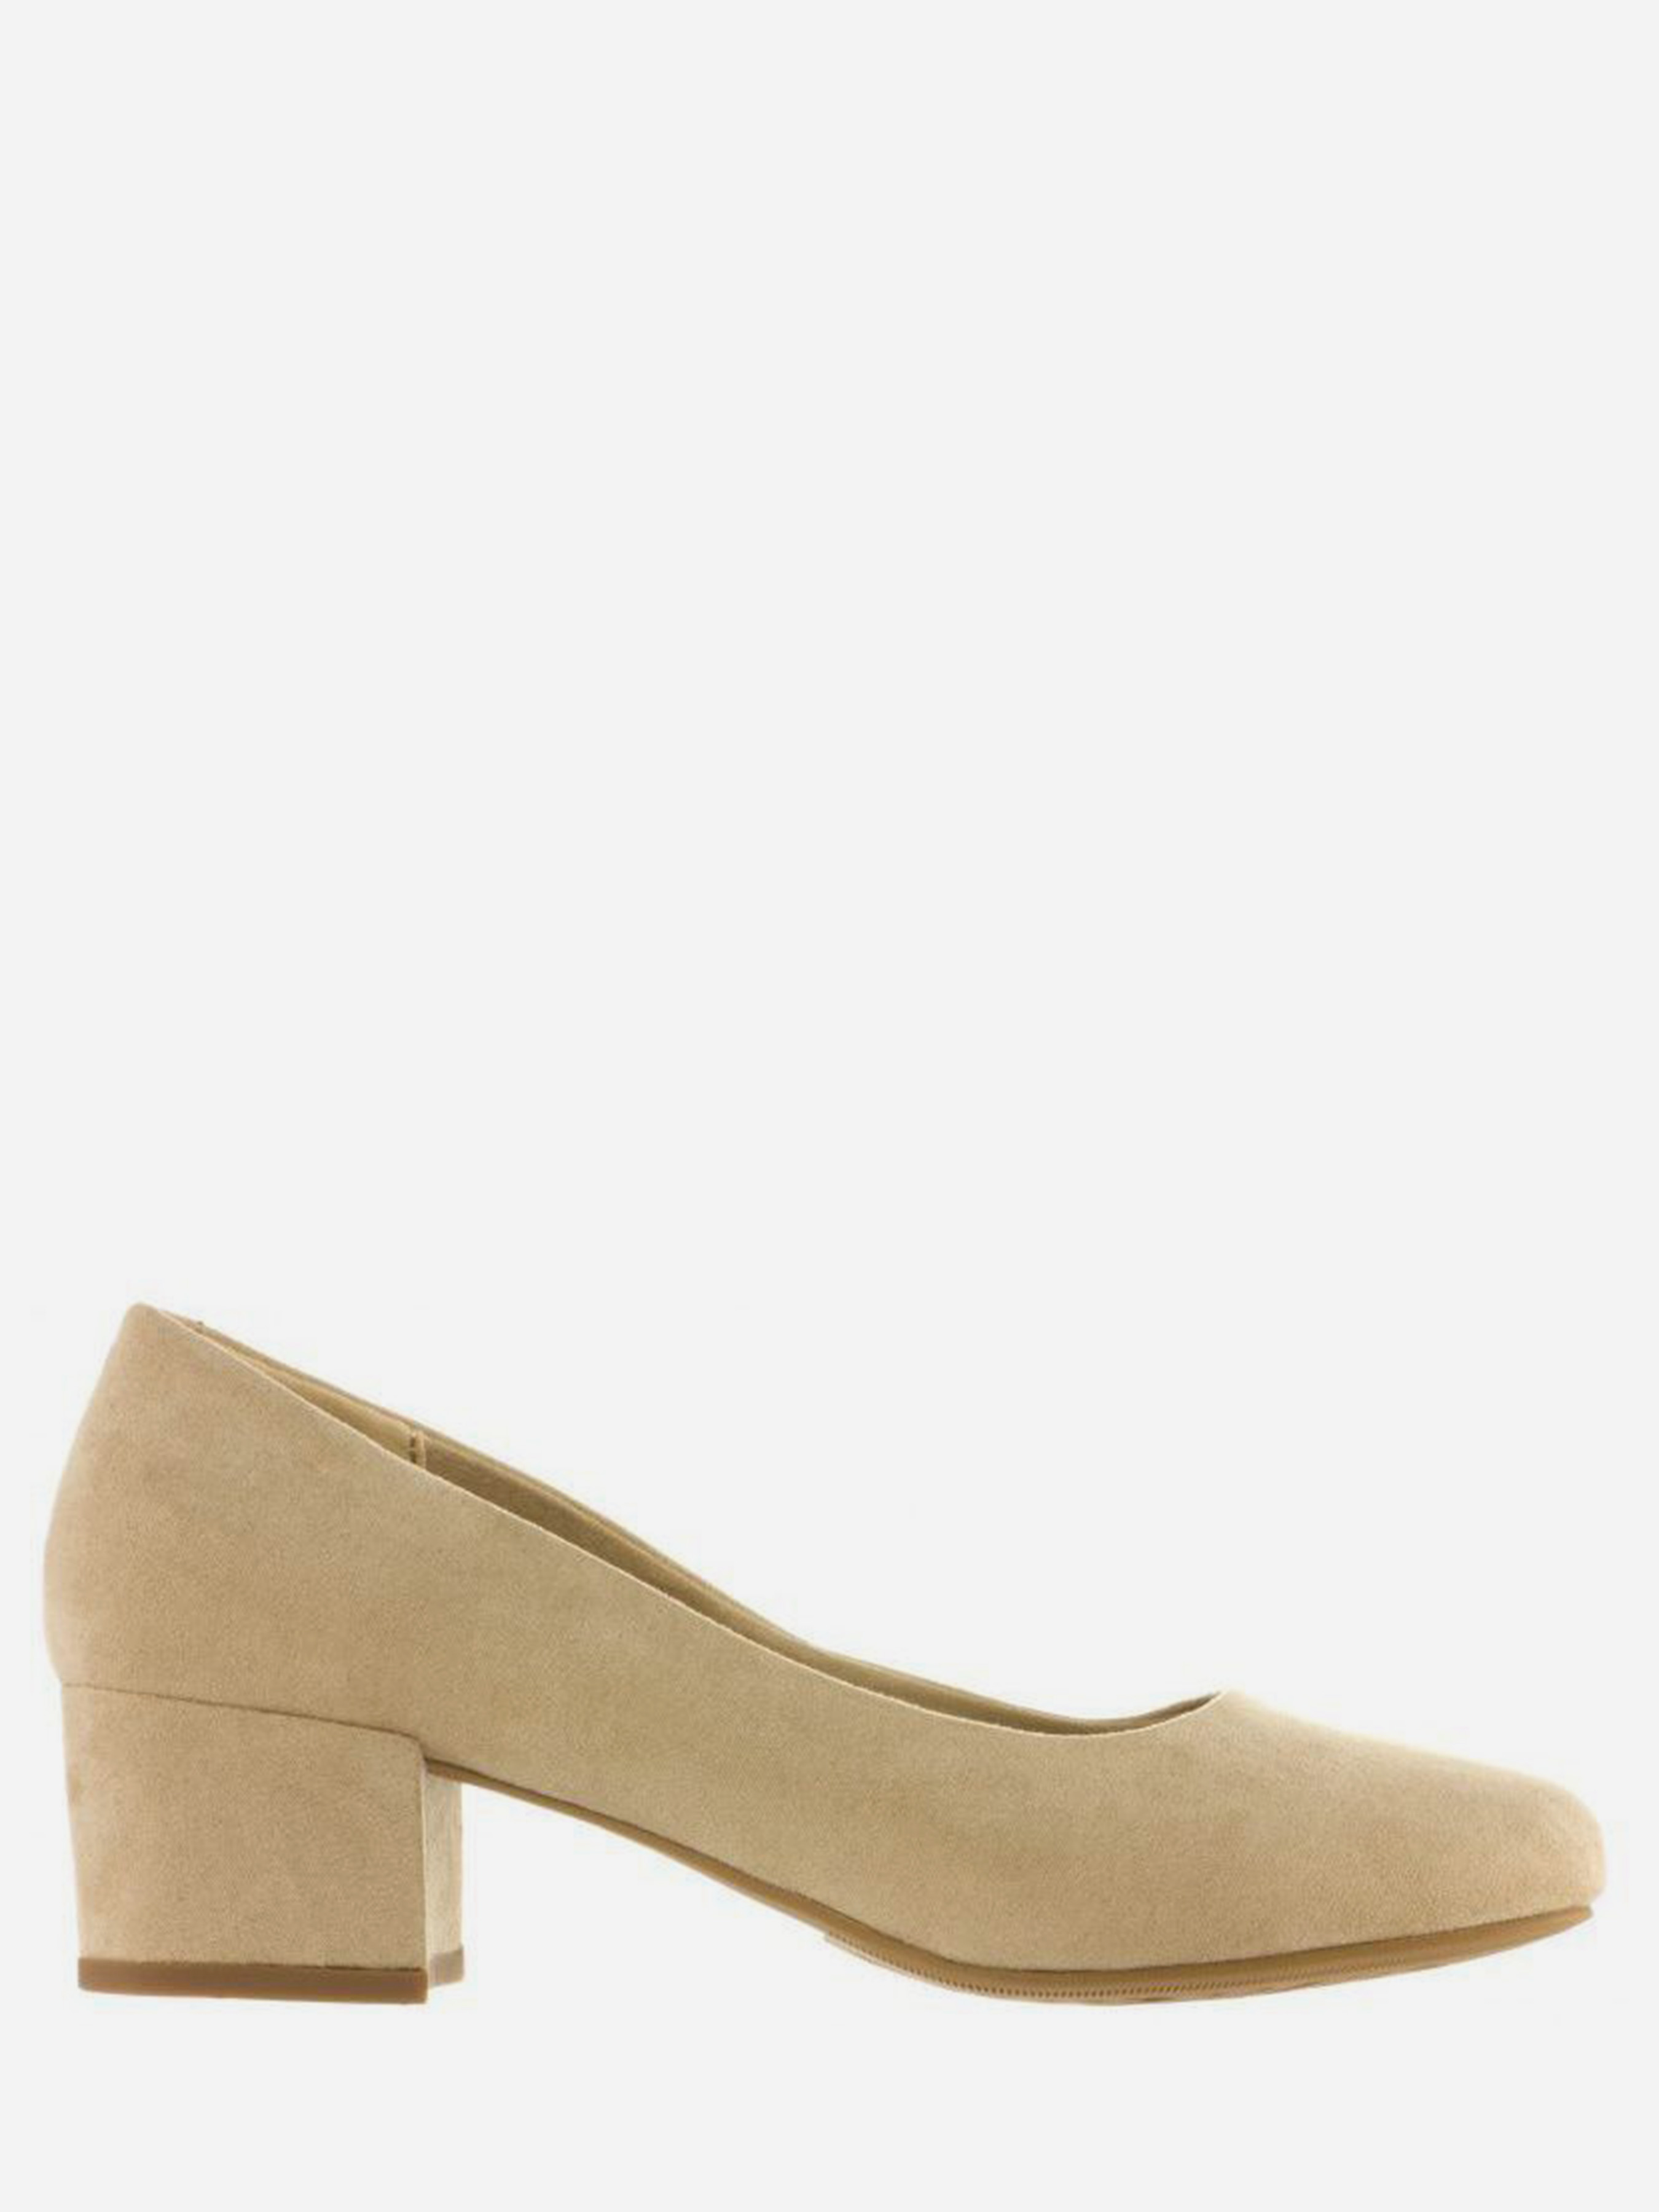 Туфли для женщин M Wone 305483 примерка, 2017